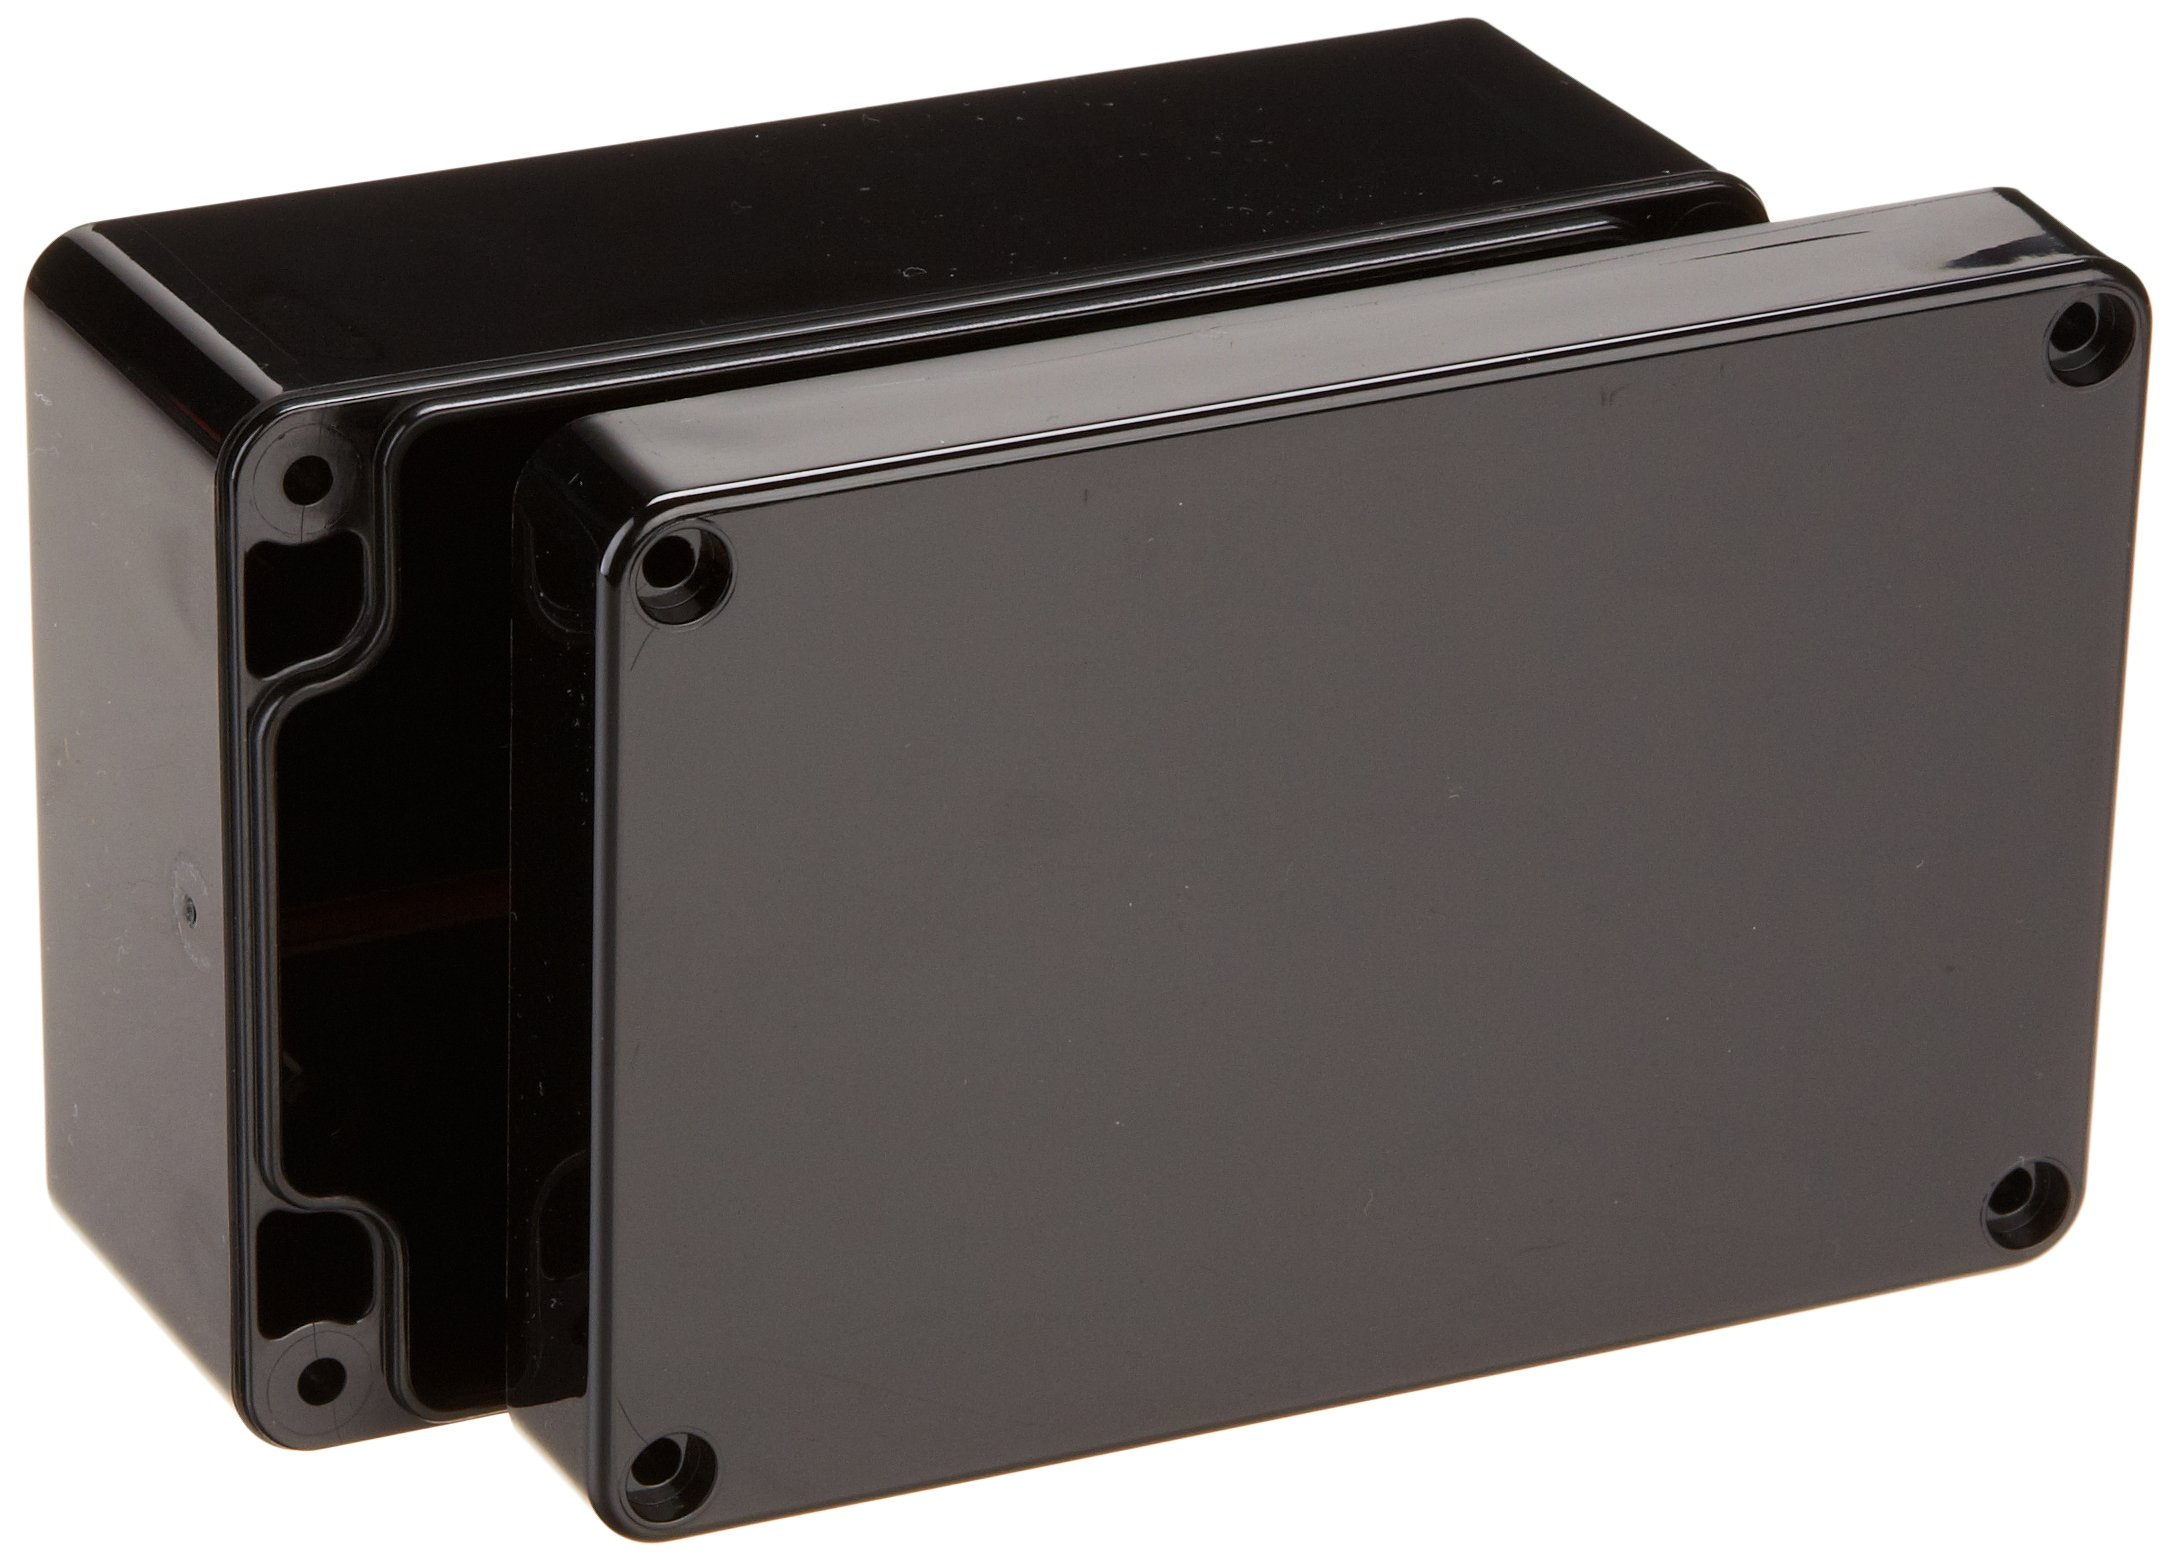 Serpac RB53-1TB1BB Polycarbonate Plastic Enclosure, 4.72'' Length x 3-5/32'' Width x 2-11/64'' Height, Top Black/Bottom Black